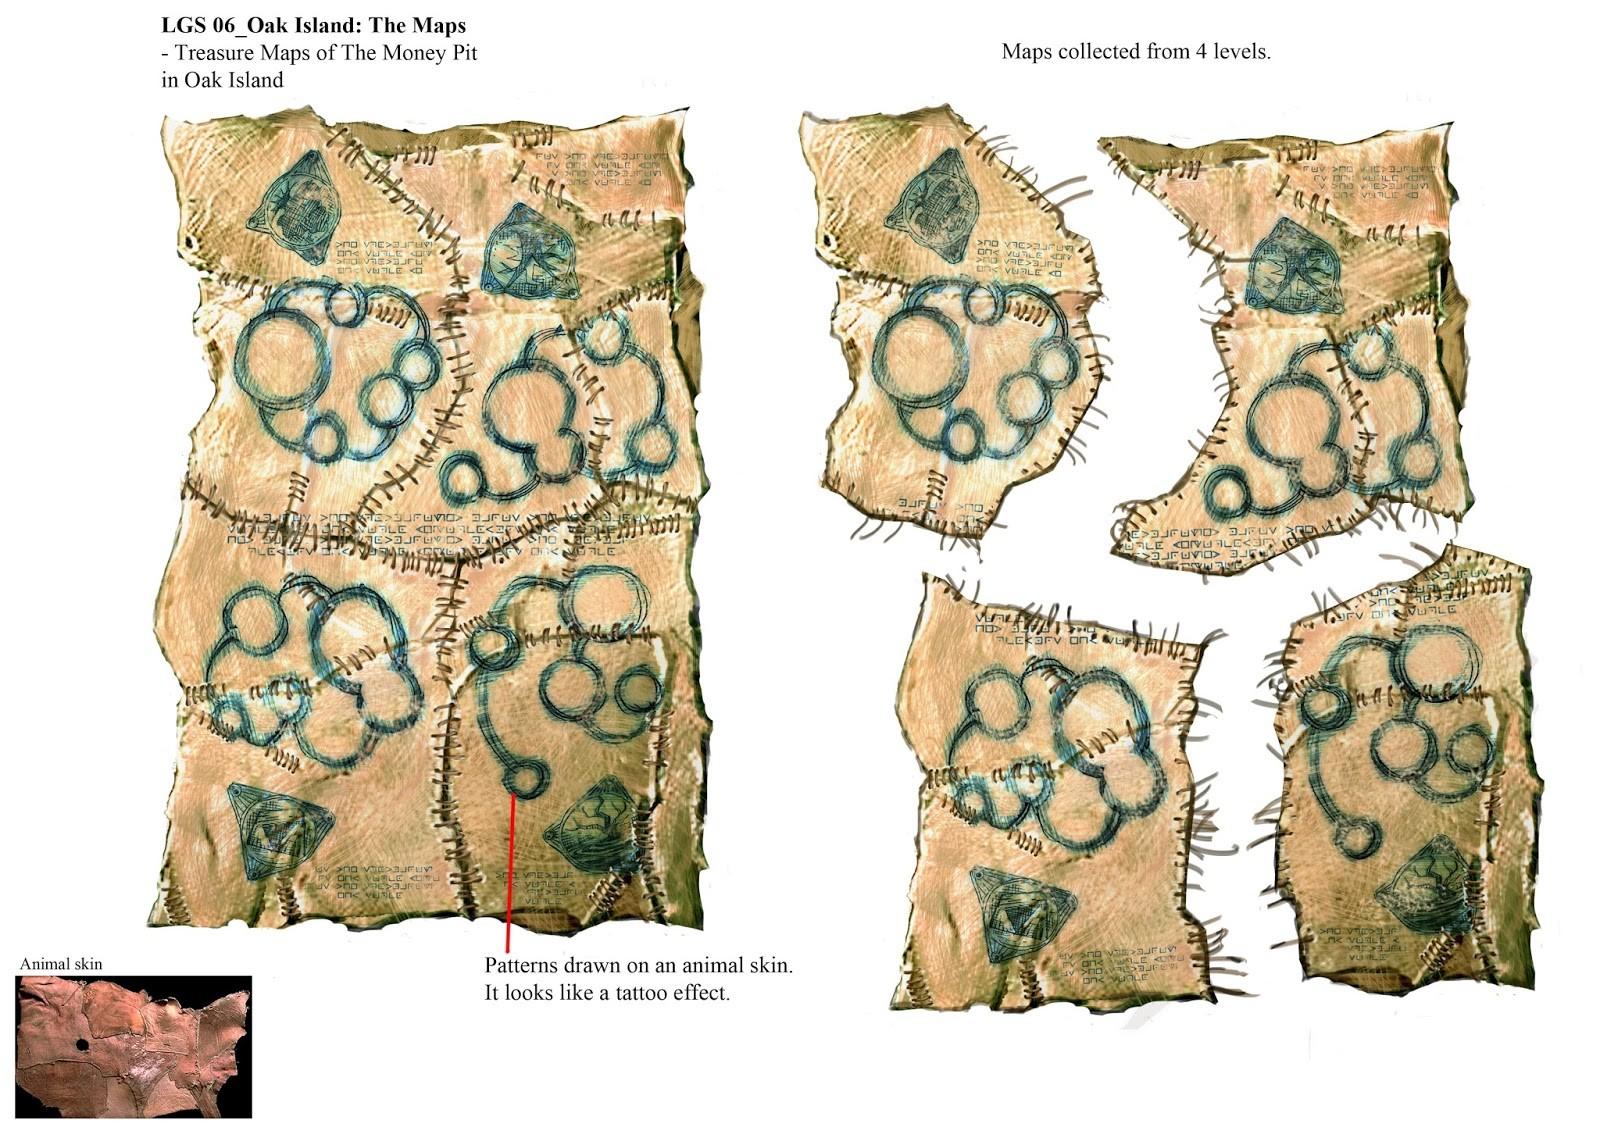 jing-cherng-wong-ac3-gp-oakisland-map02a3-jing-cherng